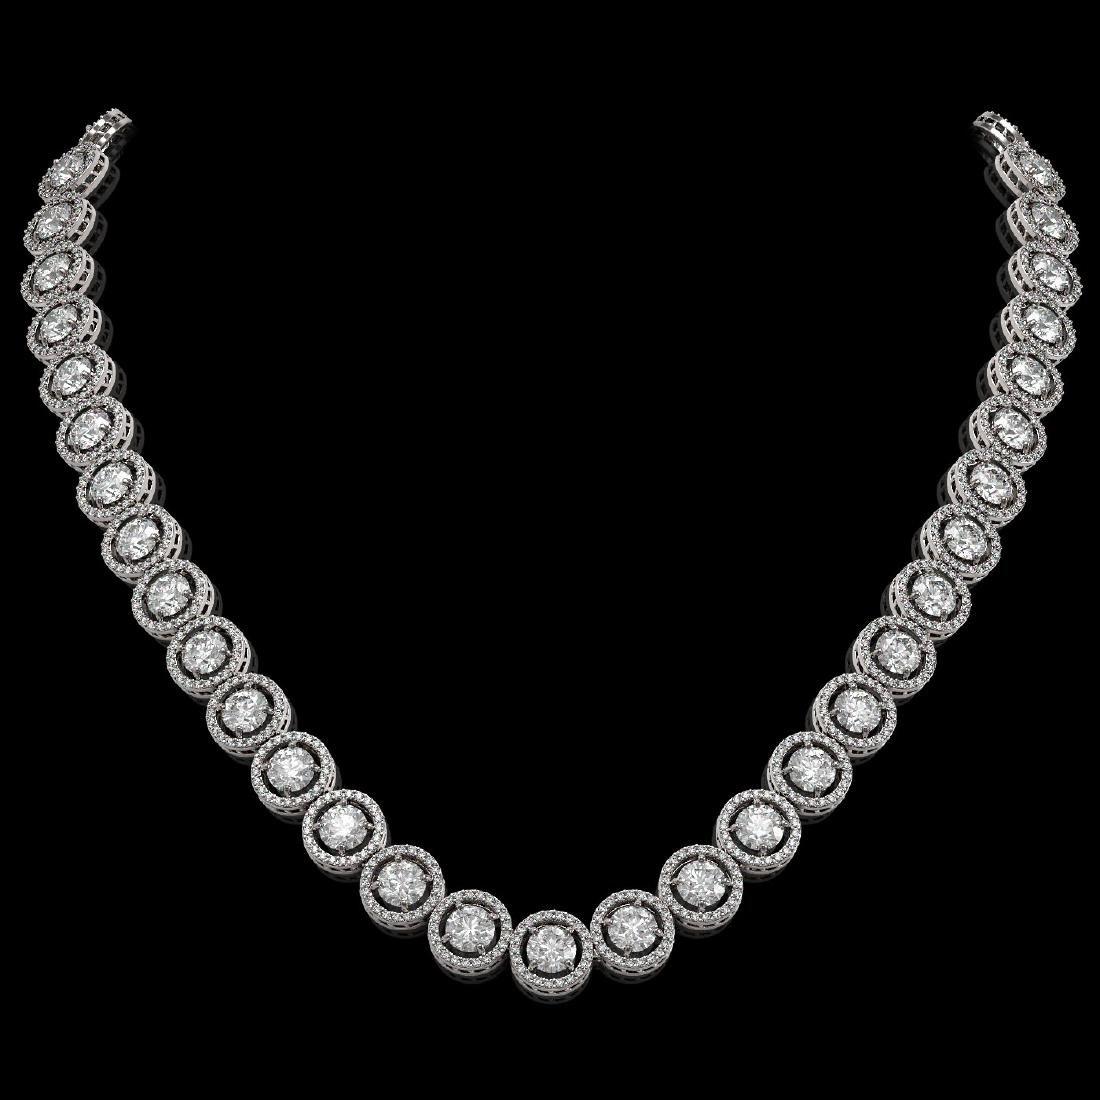 30.78 CTW Diamond Designer Necklace 18K White Gold